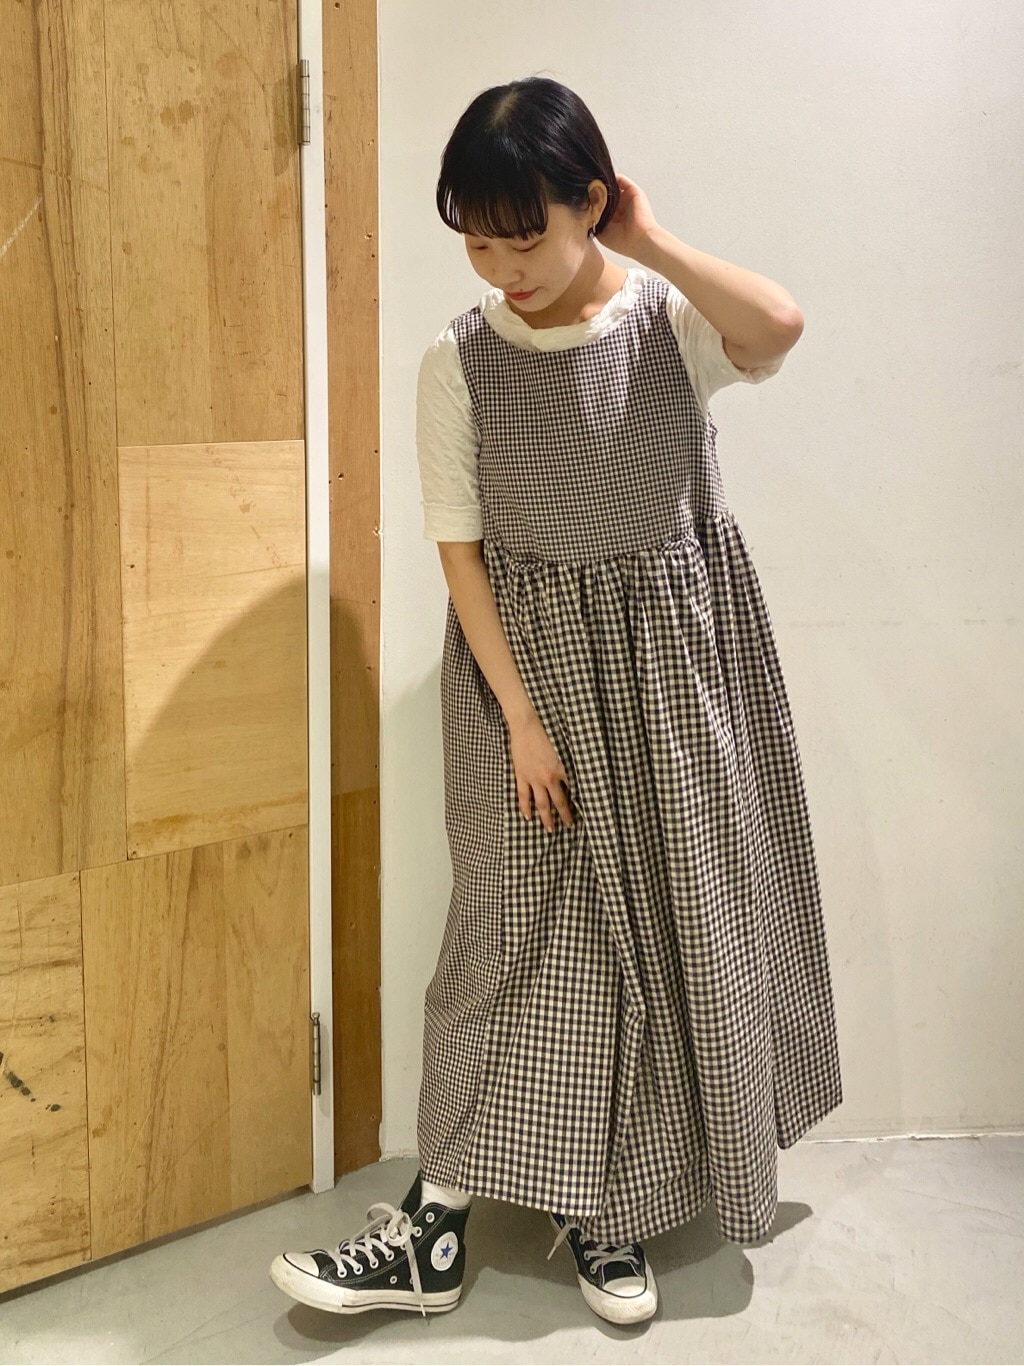 l'atelier du savon 新宿ミロード 身長:159cm 2020.06.05